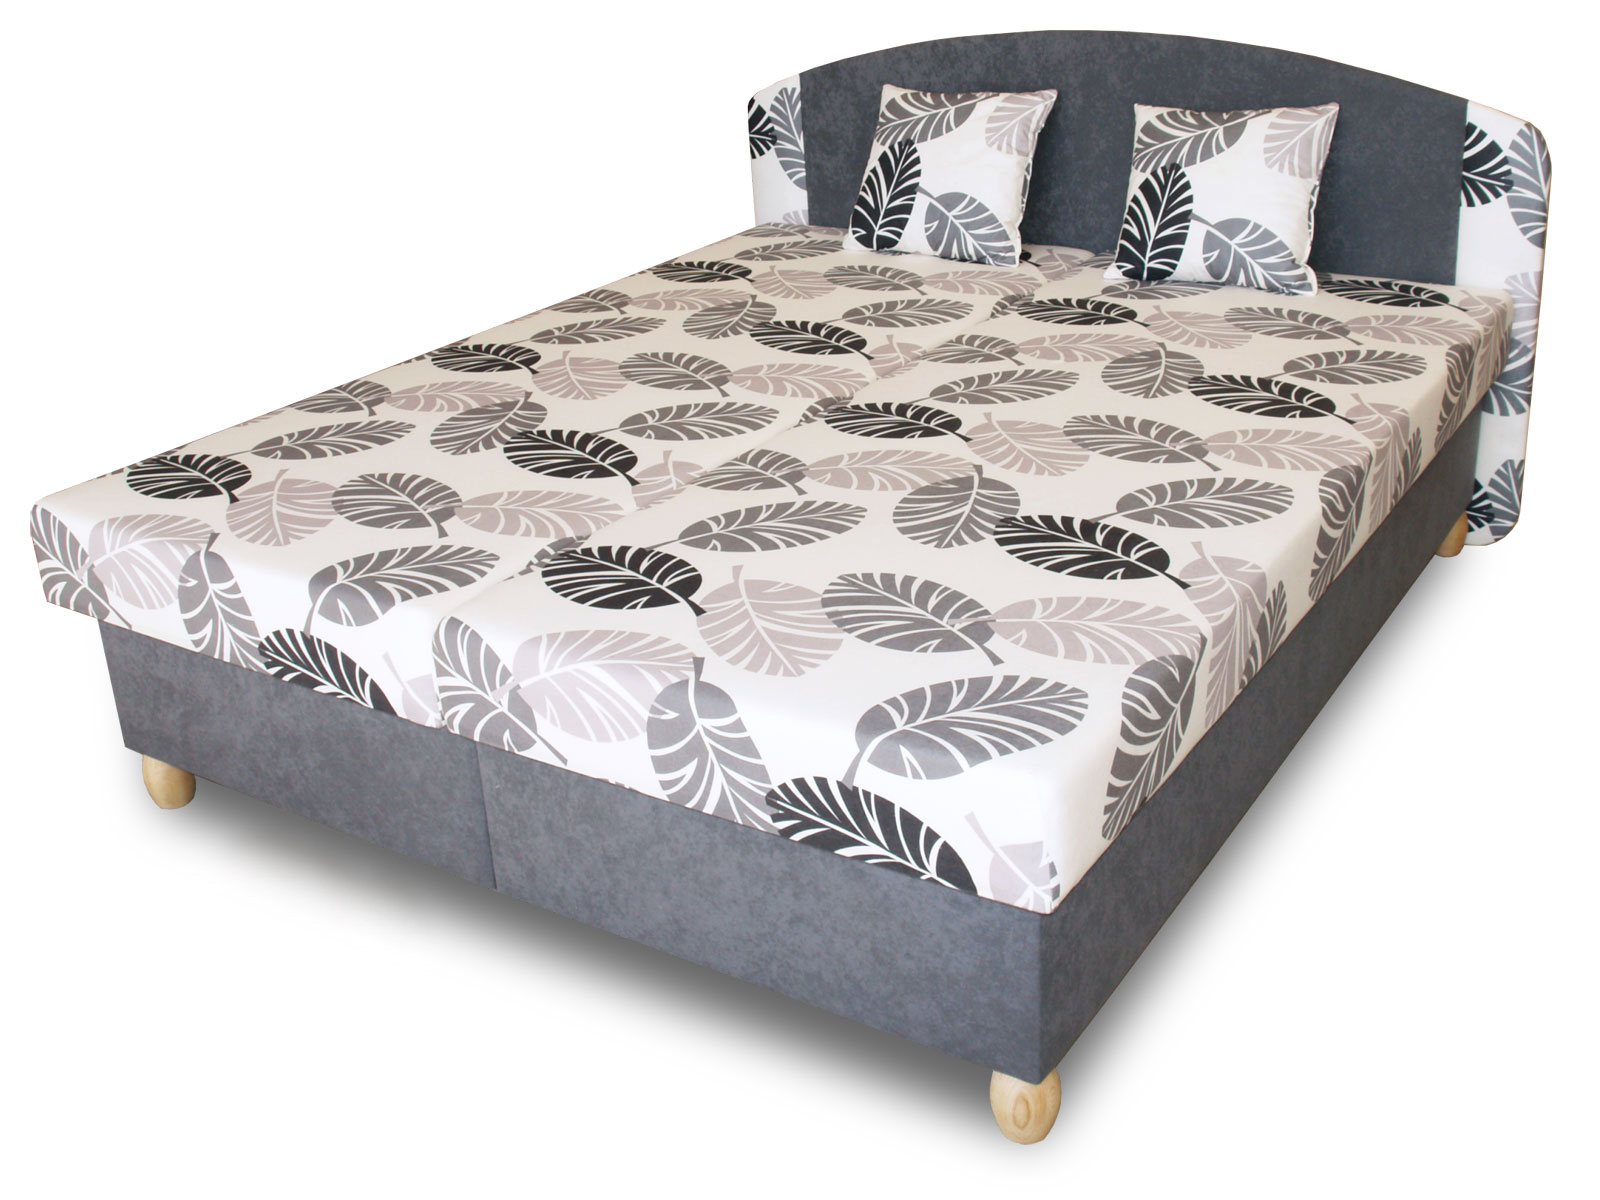 Manželská postel 160 cm - Benab - Paris (s rošty, matracemi a 2 ks polštářů)